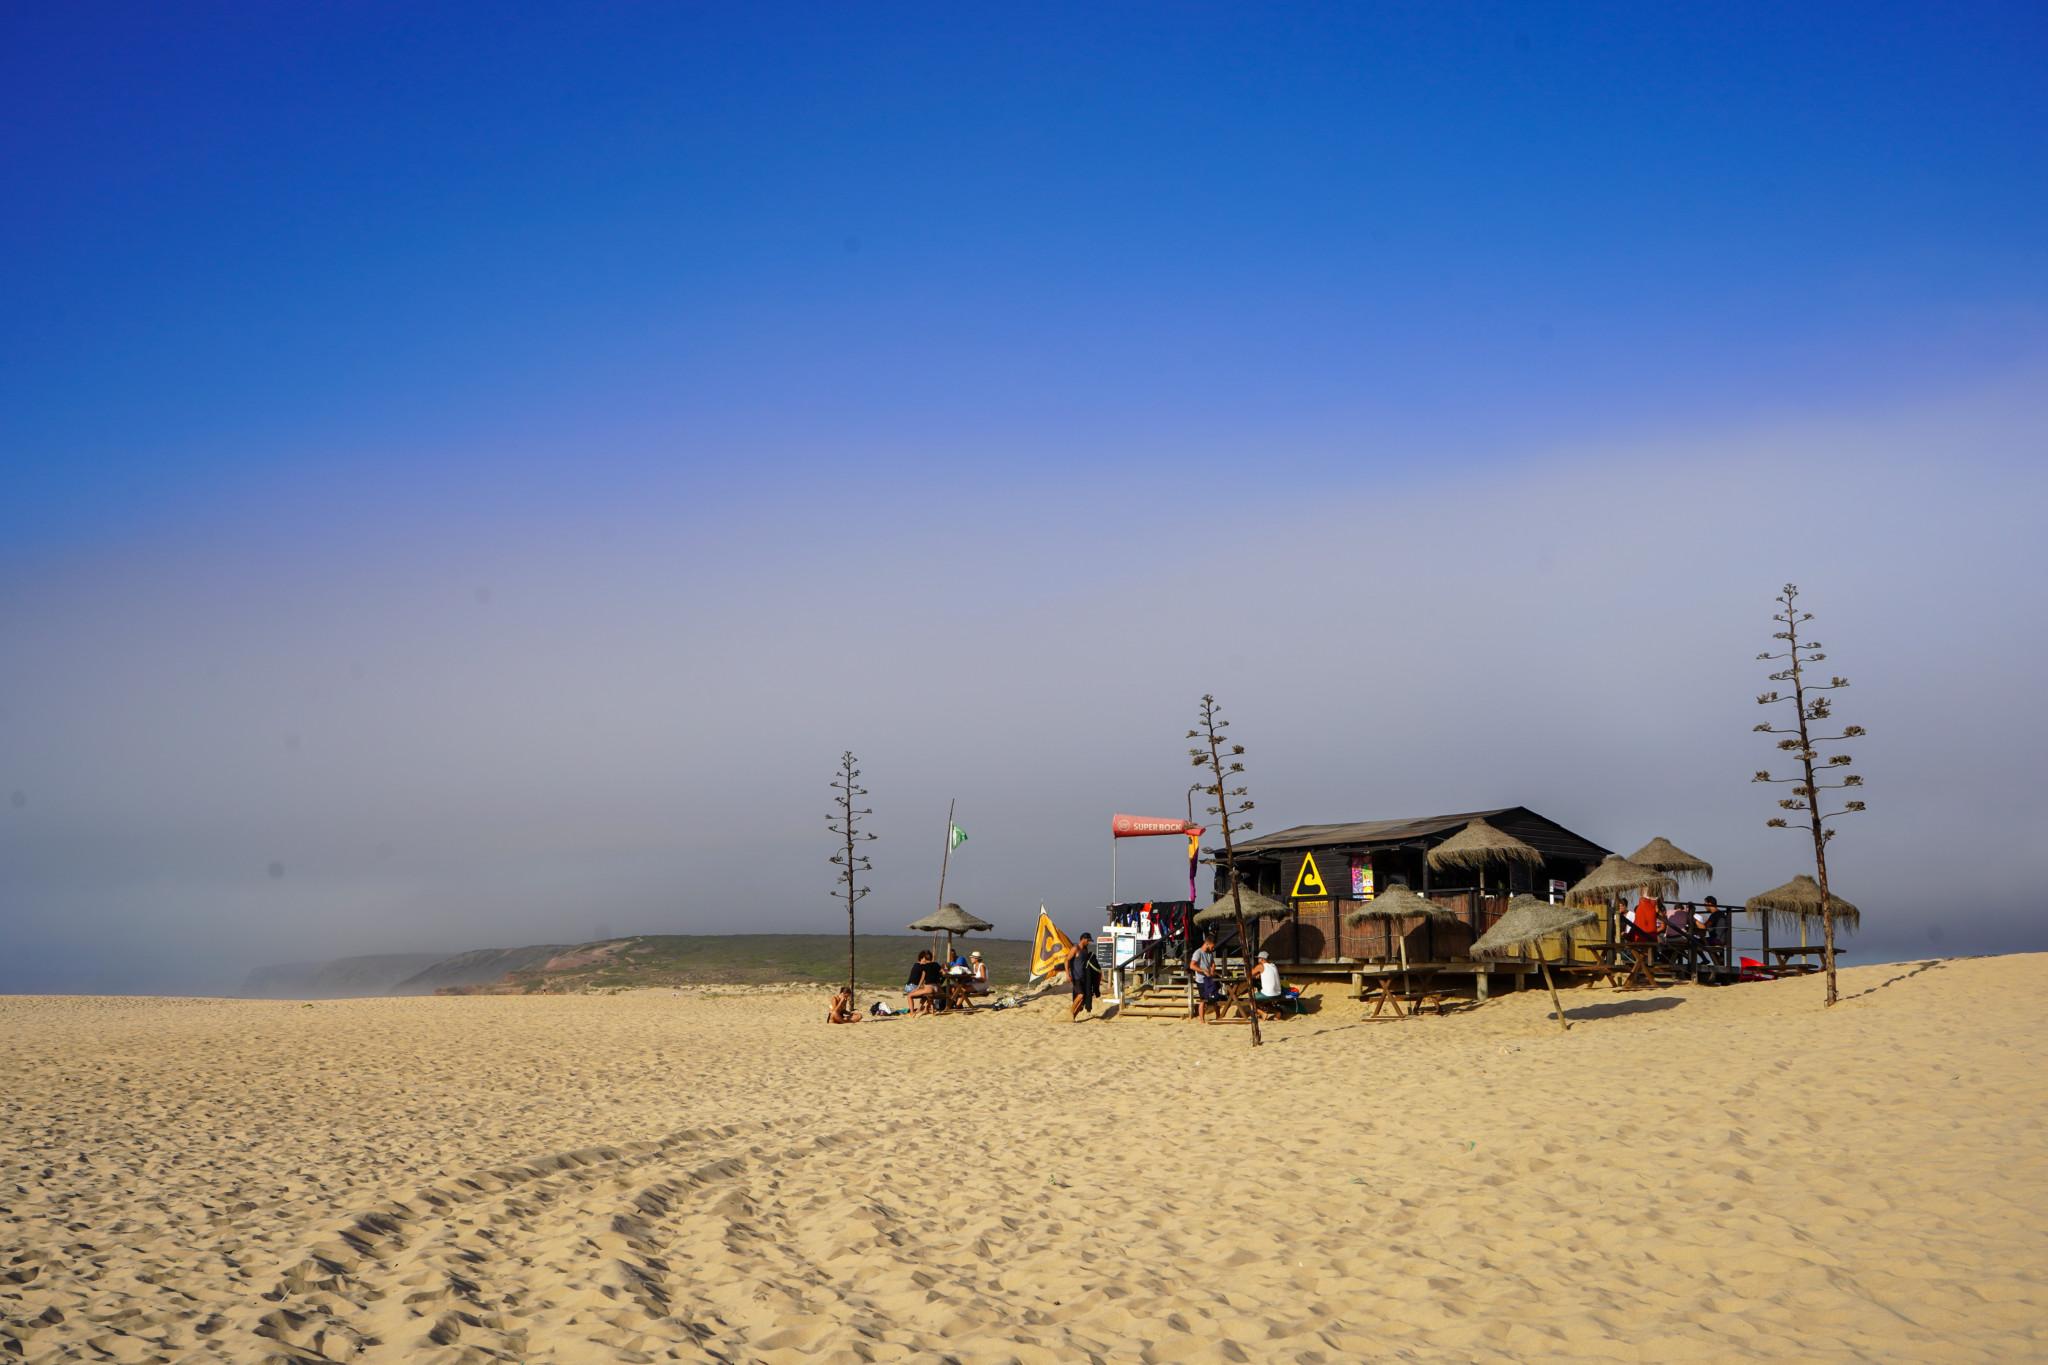 Die berühmte Strandbar in Bordeira